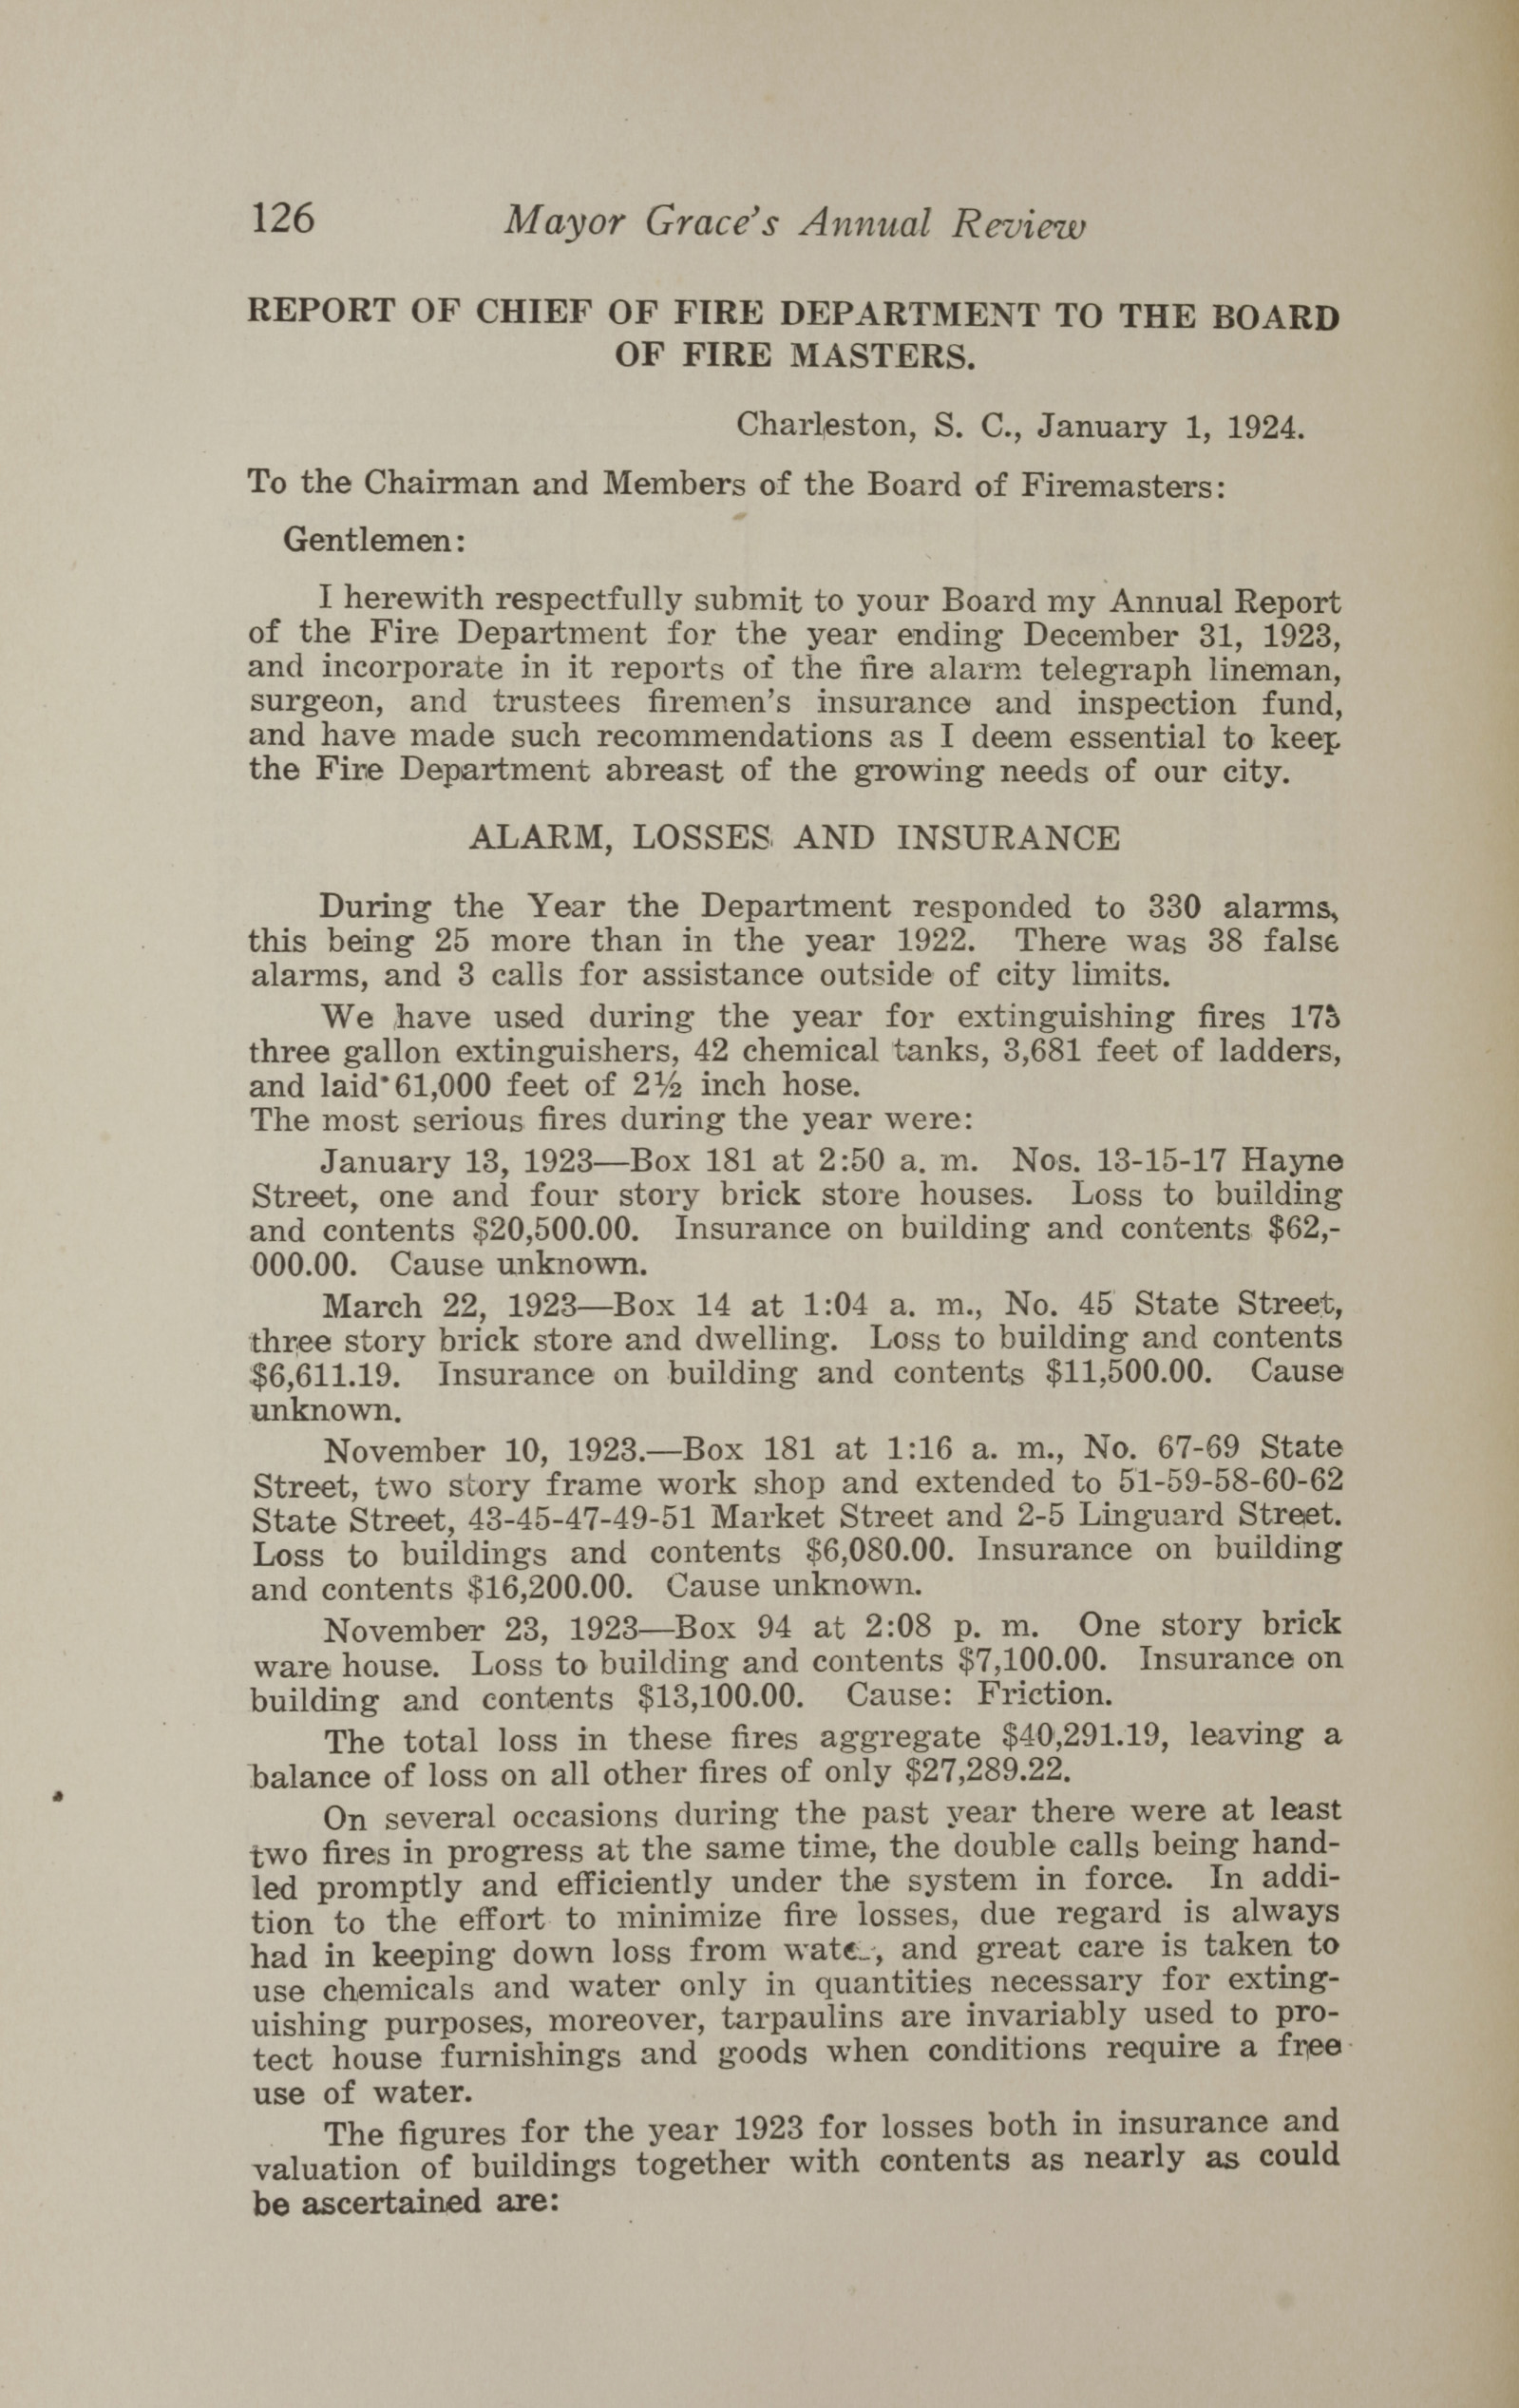 Charleston Yearbook, 1923, page 126